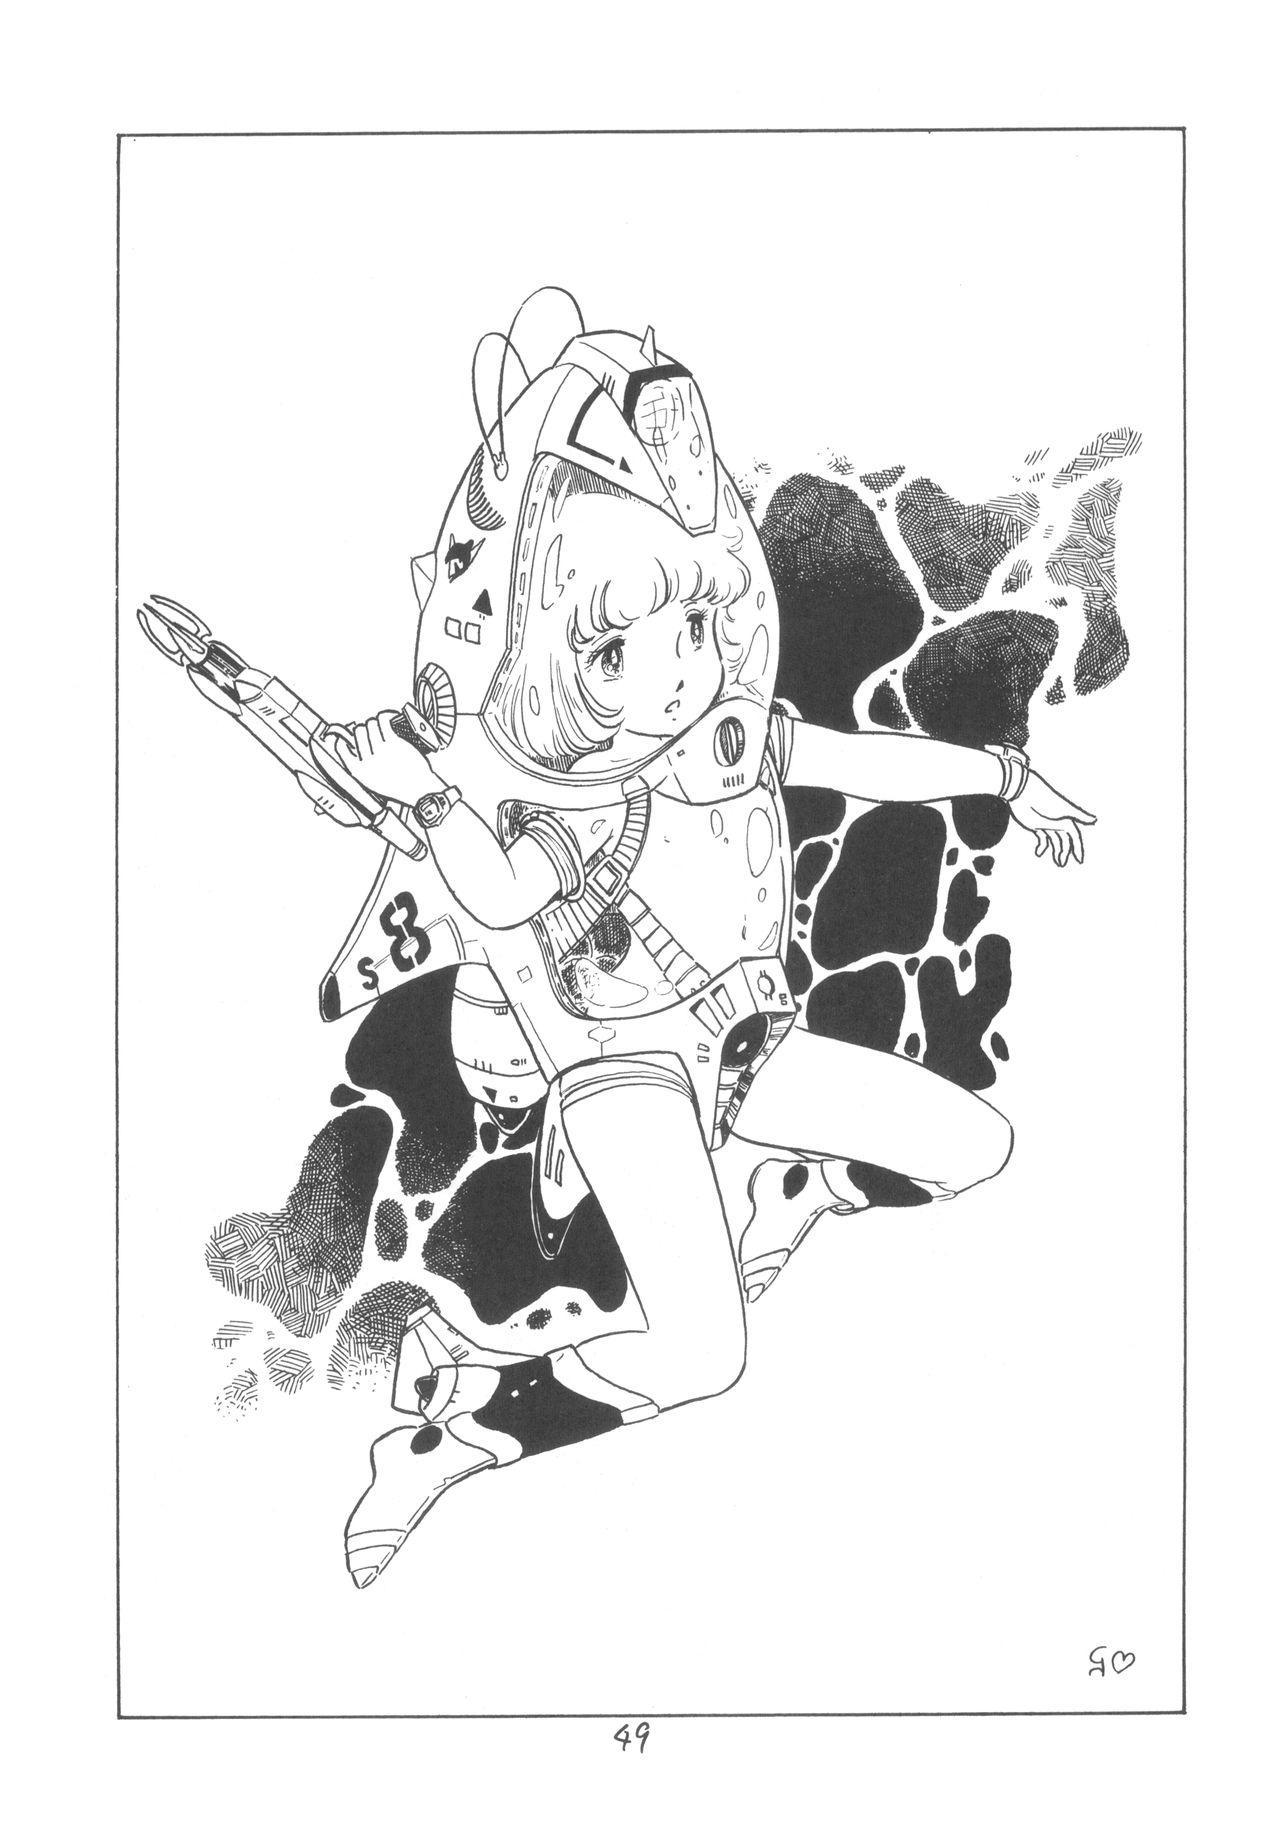 TEKUNO RORIA 50